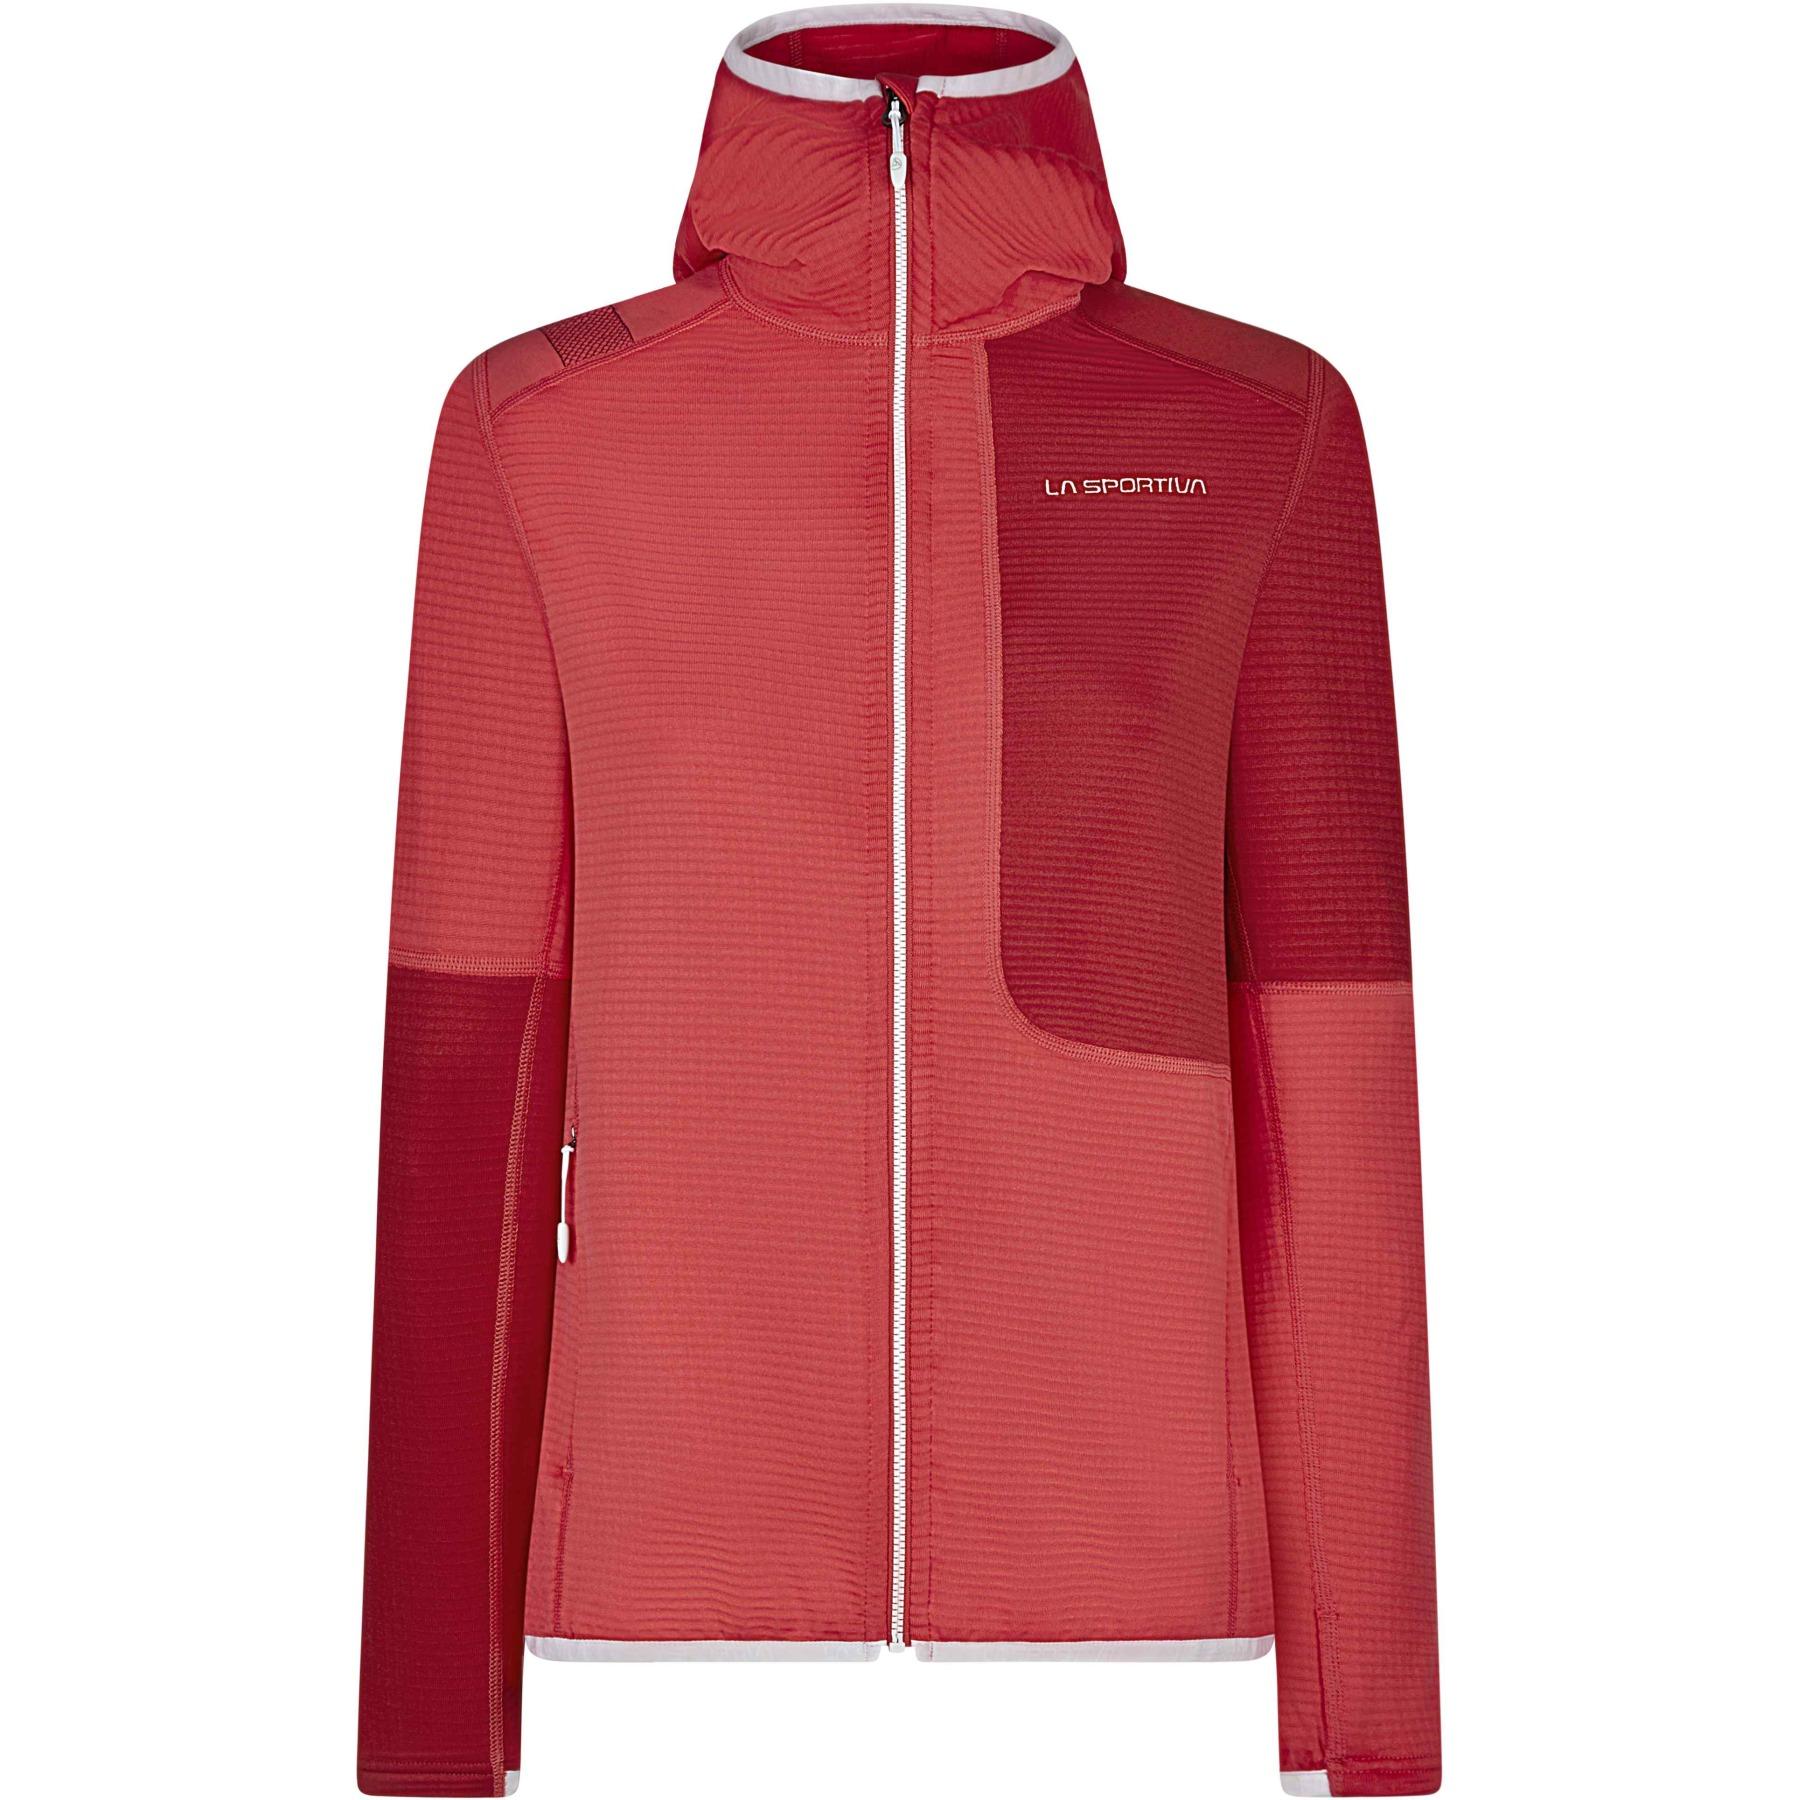 La Sportiva Granite Hoody Jacket Women - Hibiscus/Grape